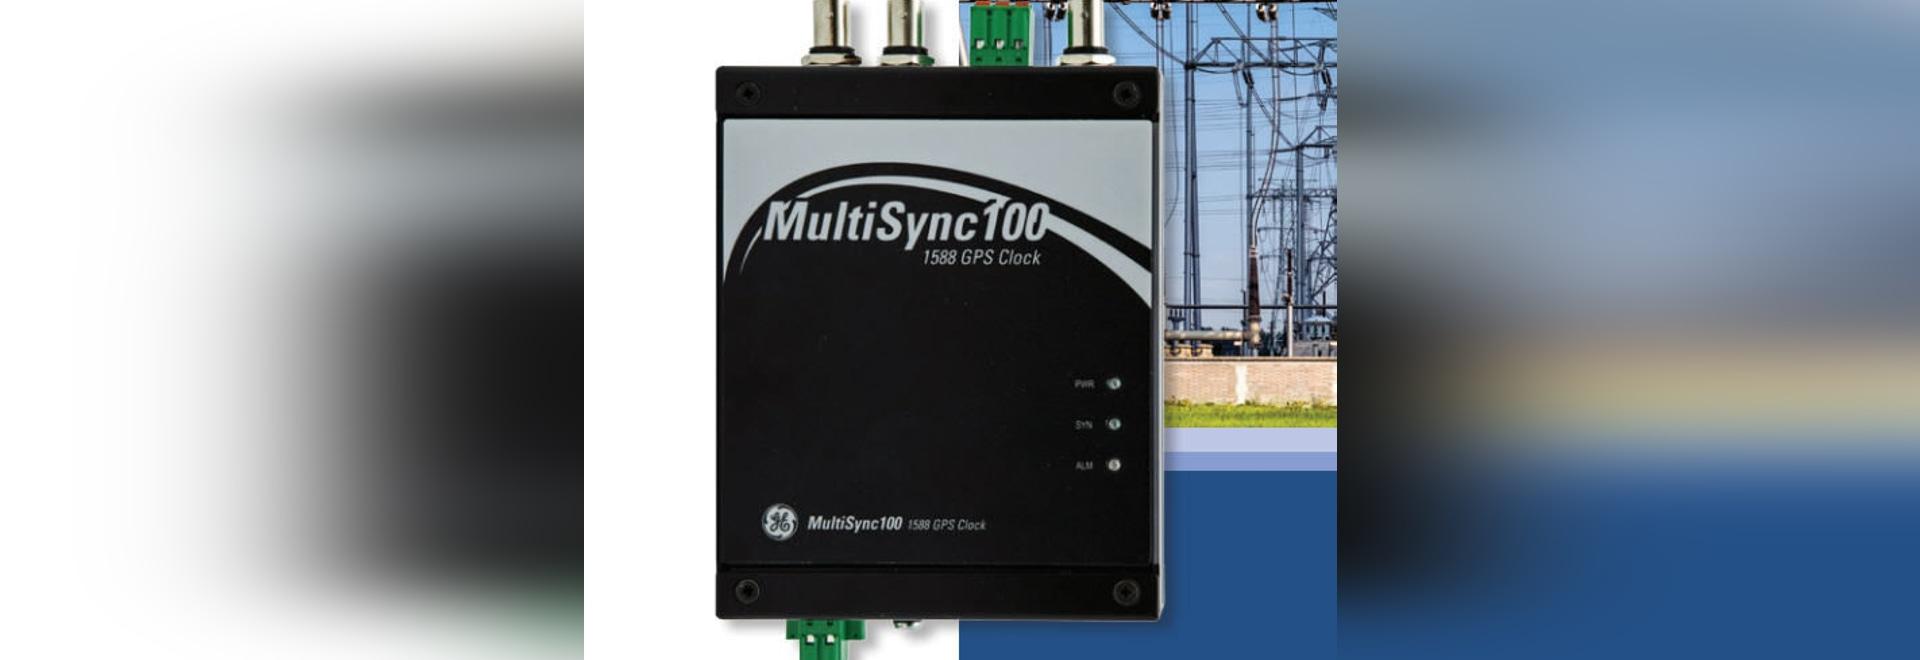 Modernize time synchronization for power systems